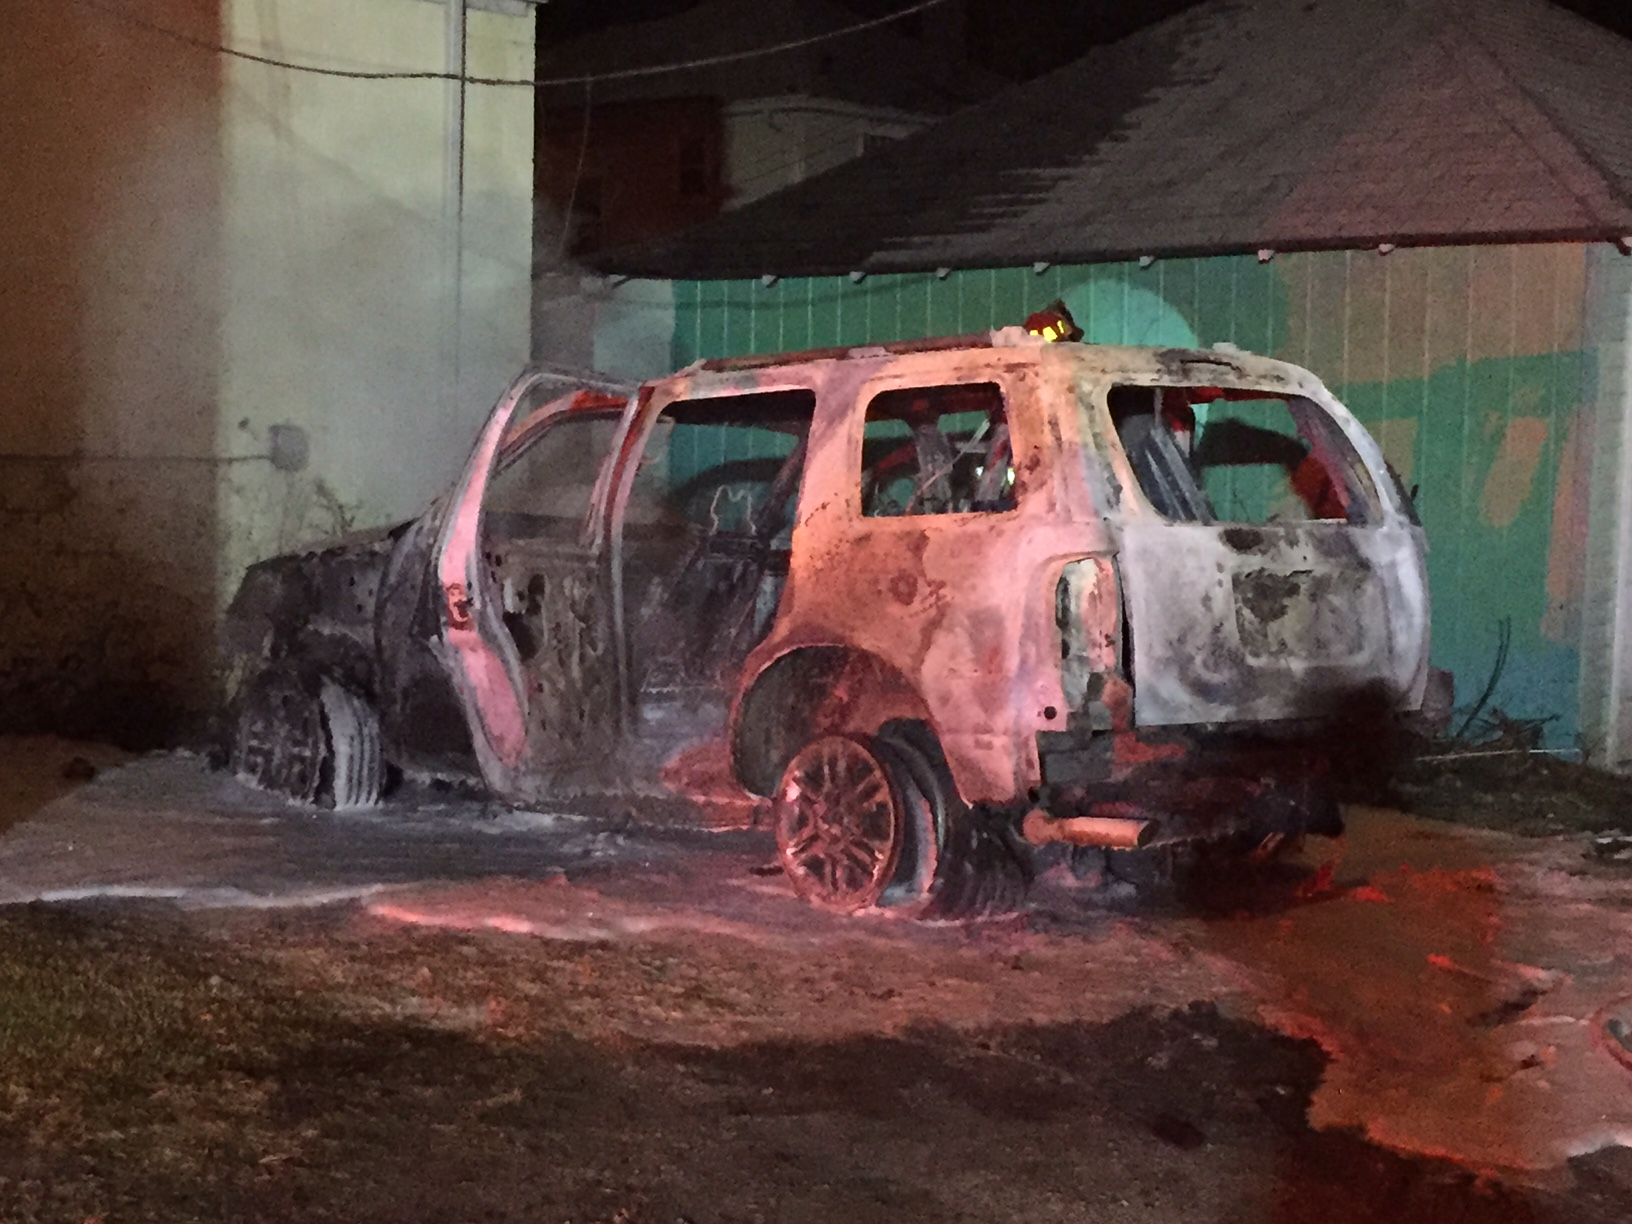 Runnion and High SUV Fire